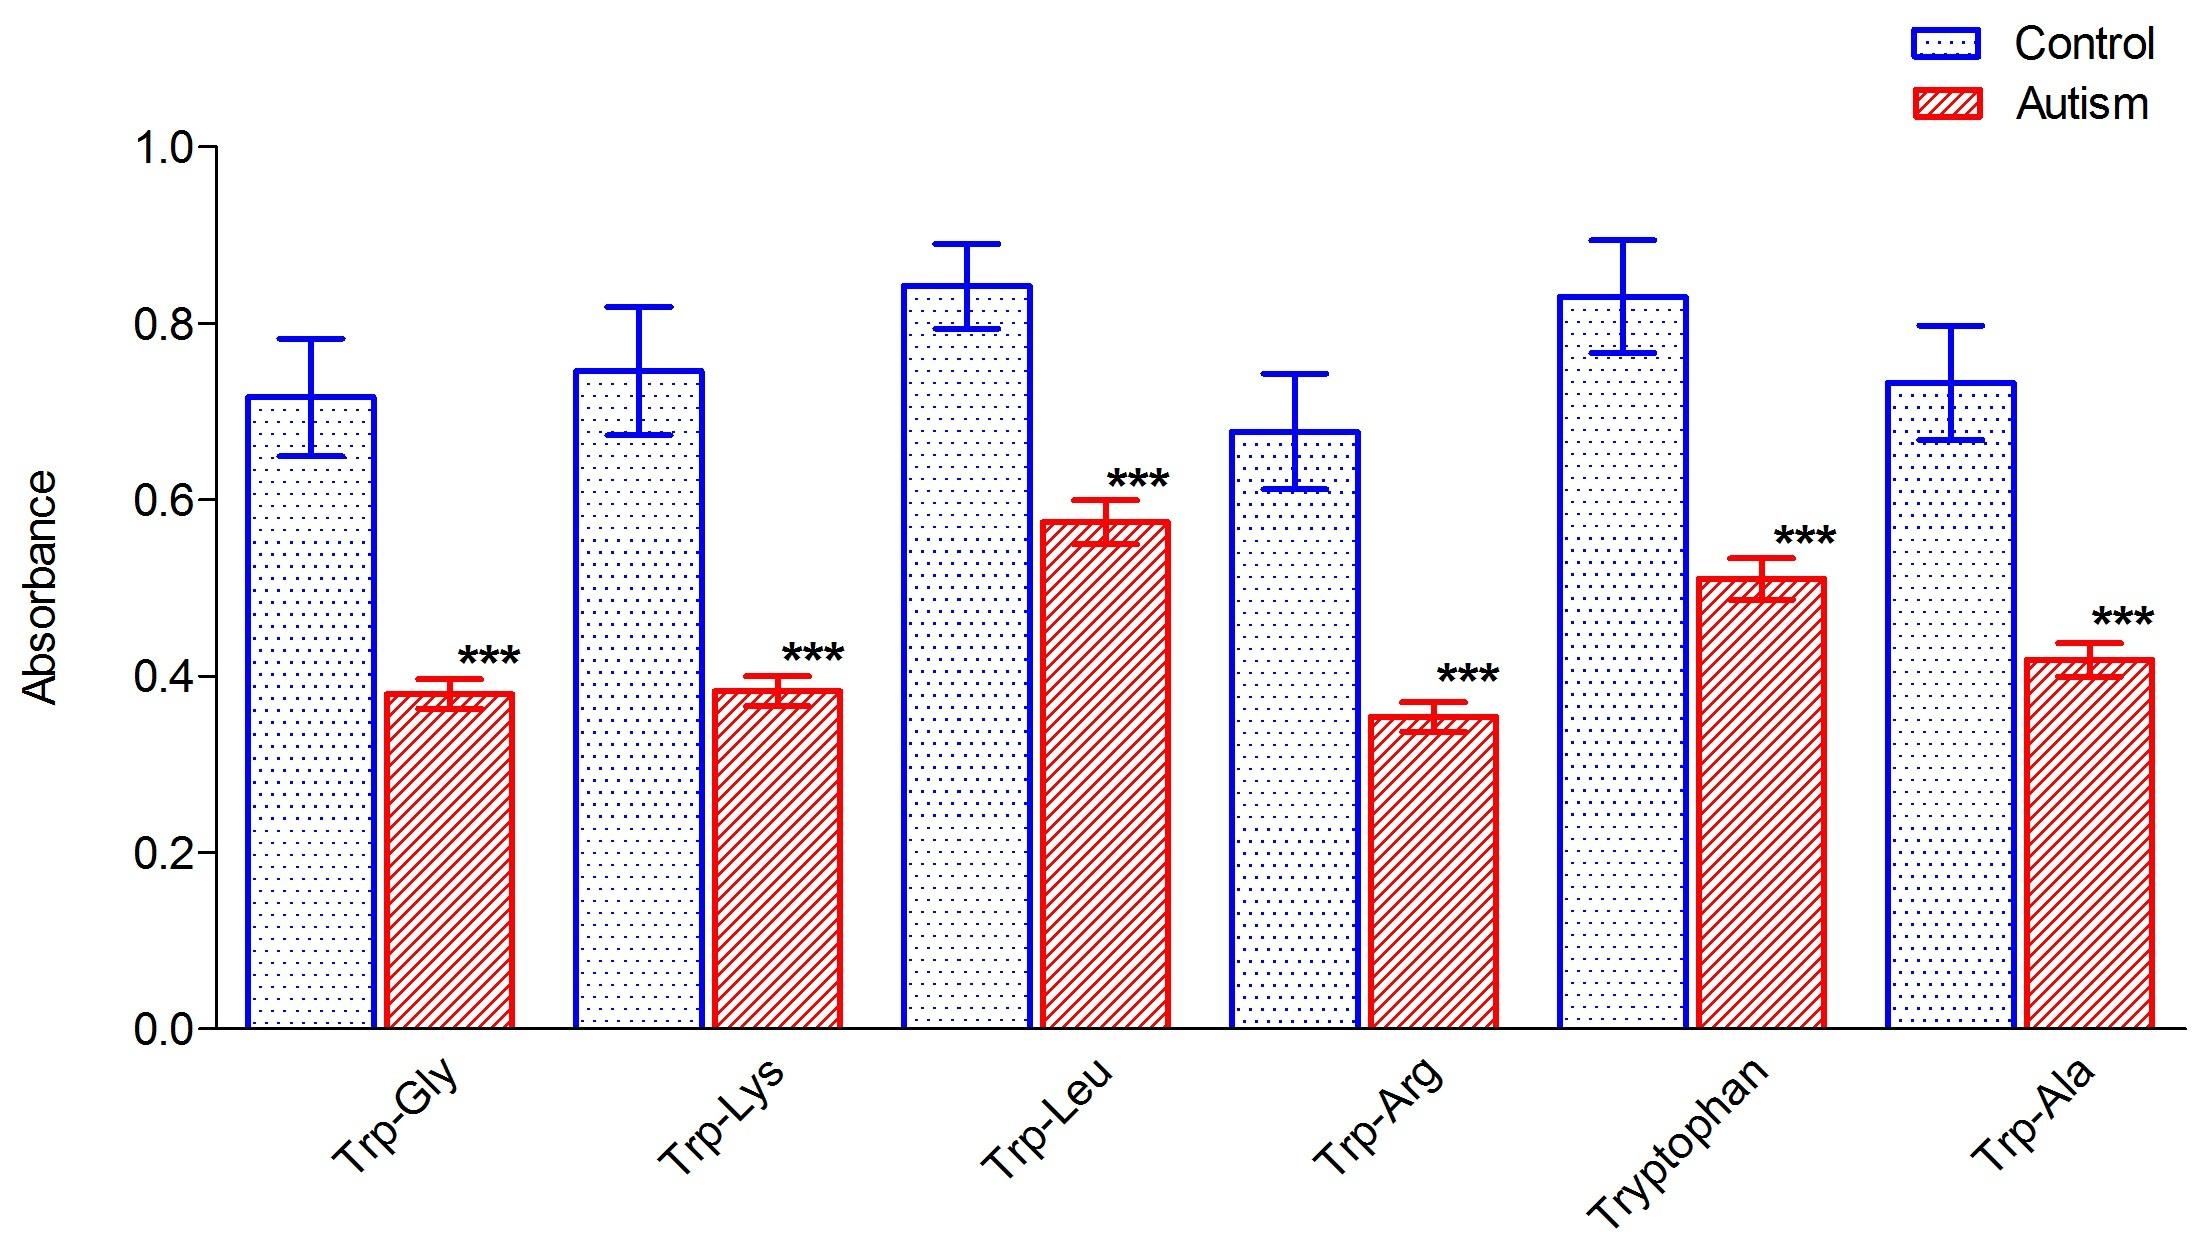 Decreased tryptophan metabolism in patients with autism spectrum